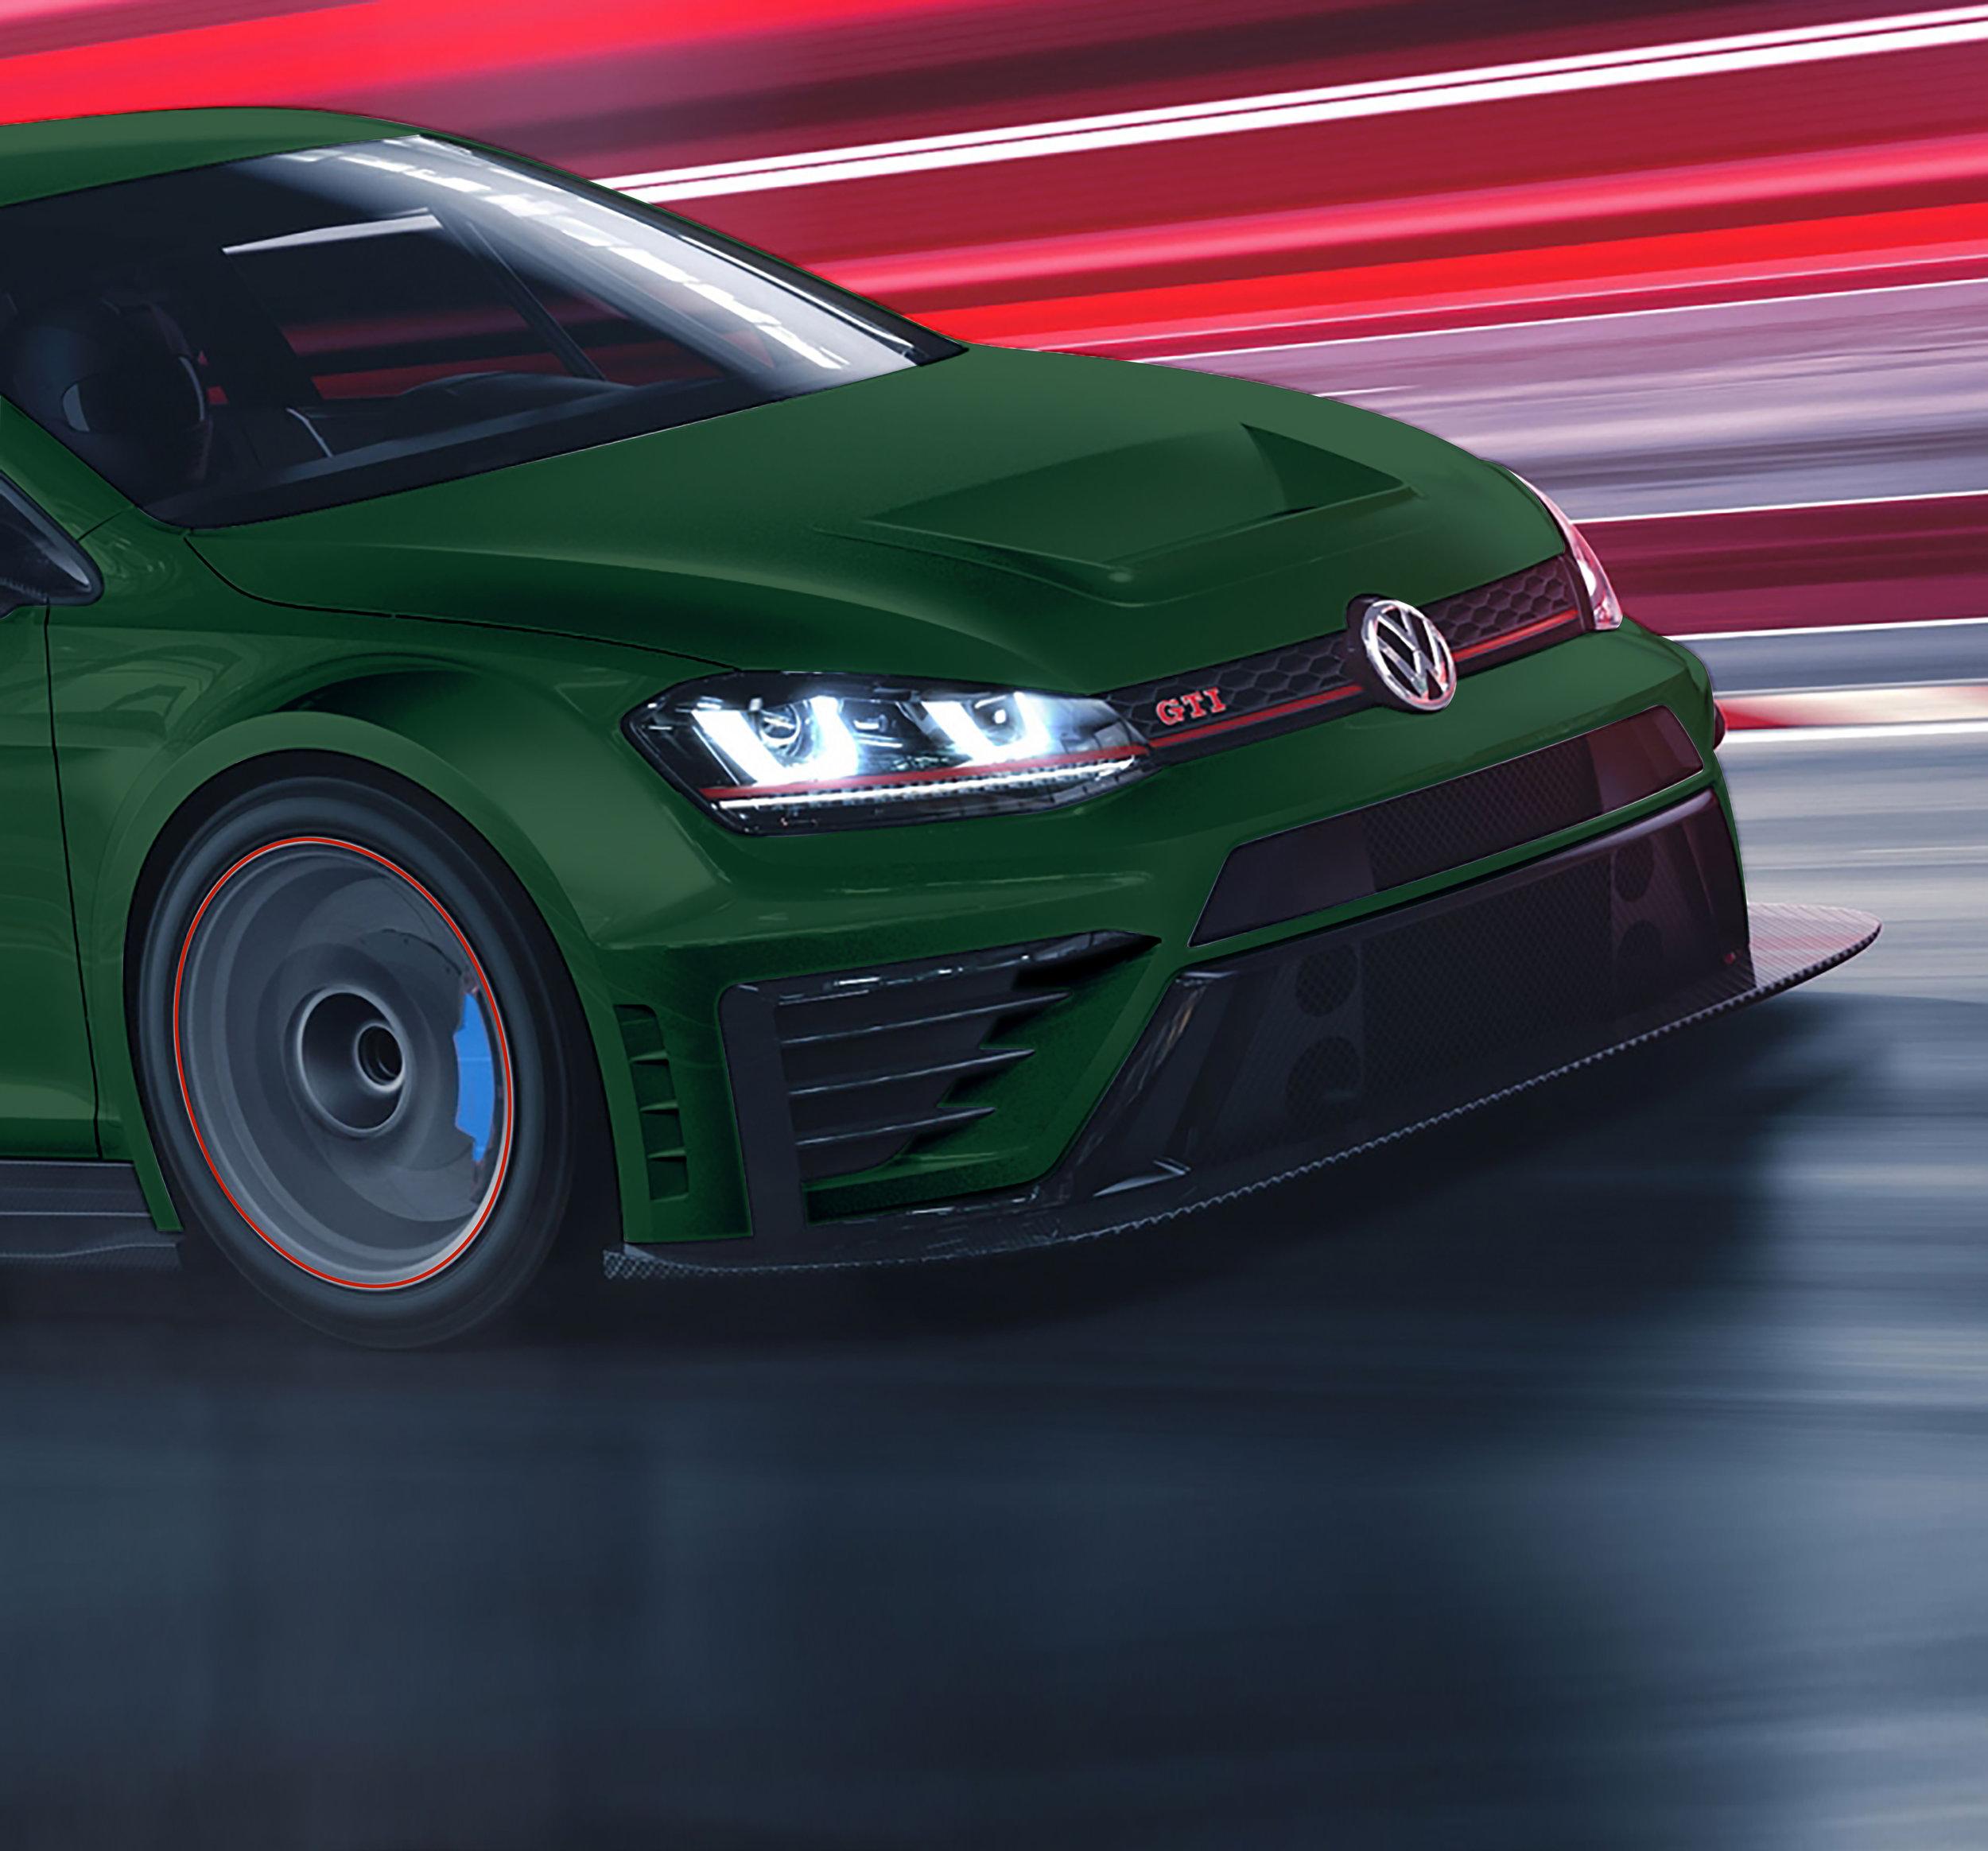 VW Golf GTI TCR auf YOKOHAMA ADVAN NEOVA AD08R tuned by Peter Muggiano